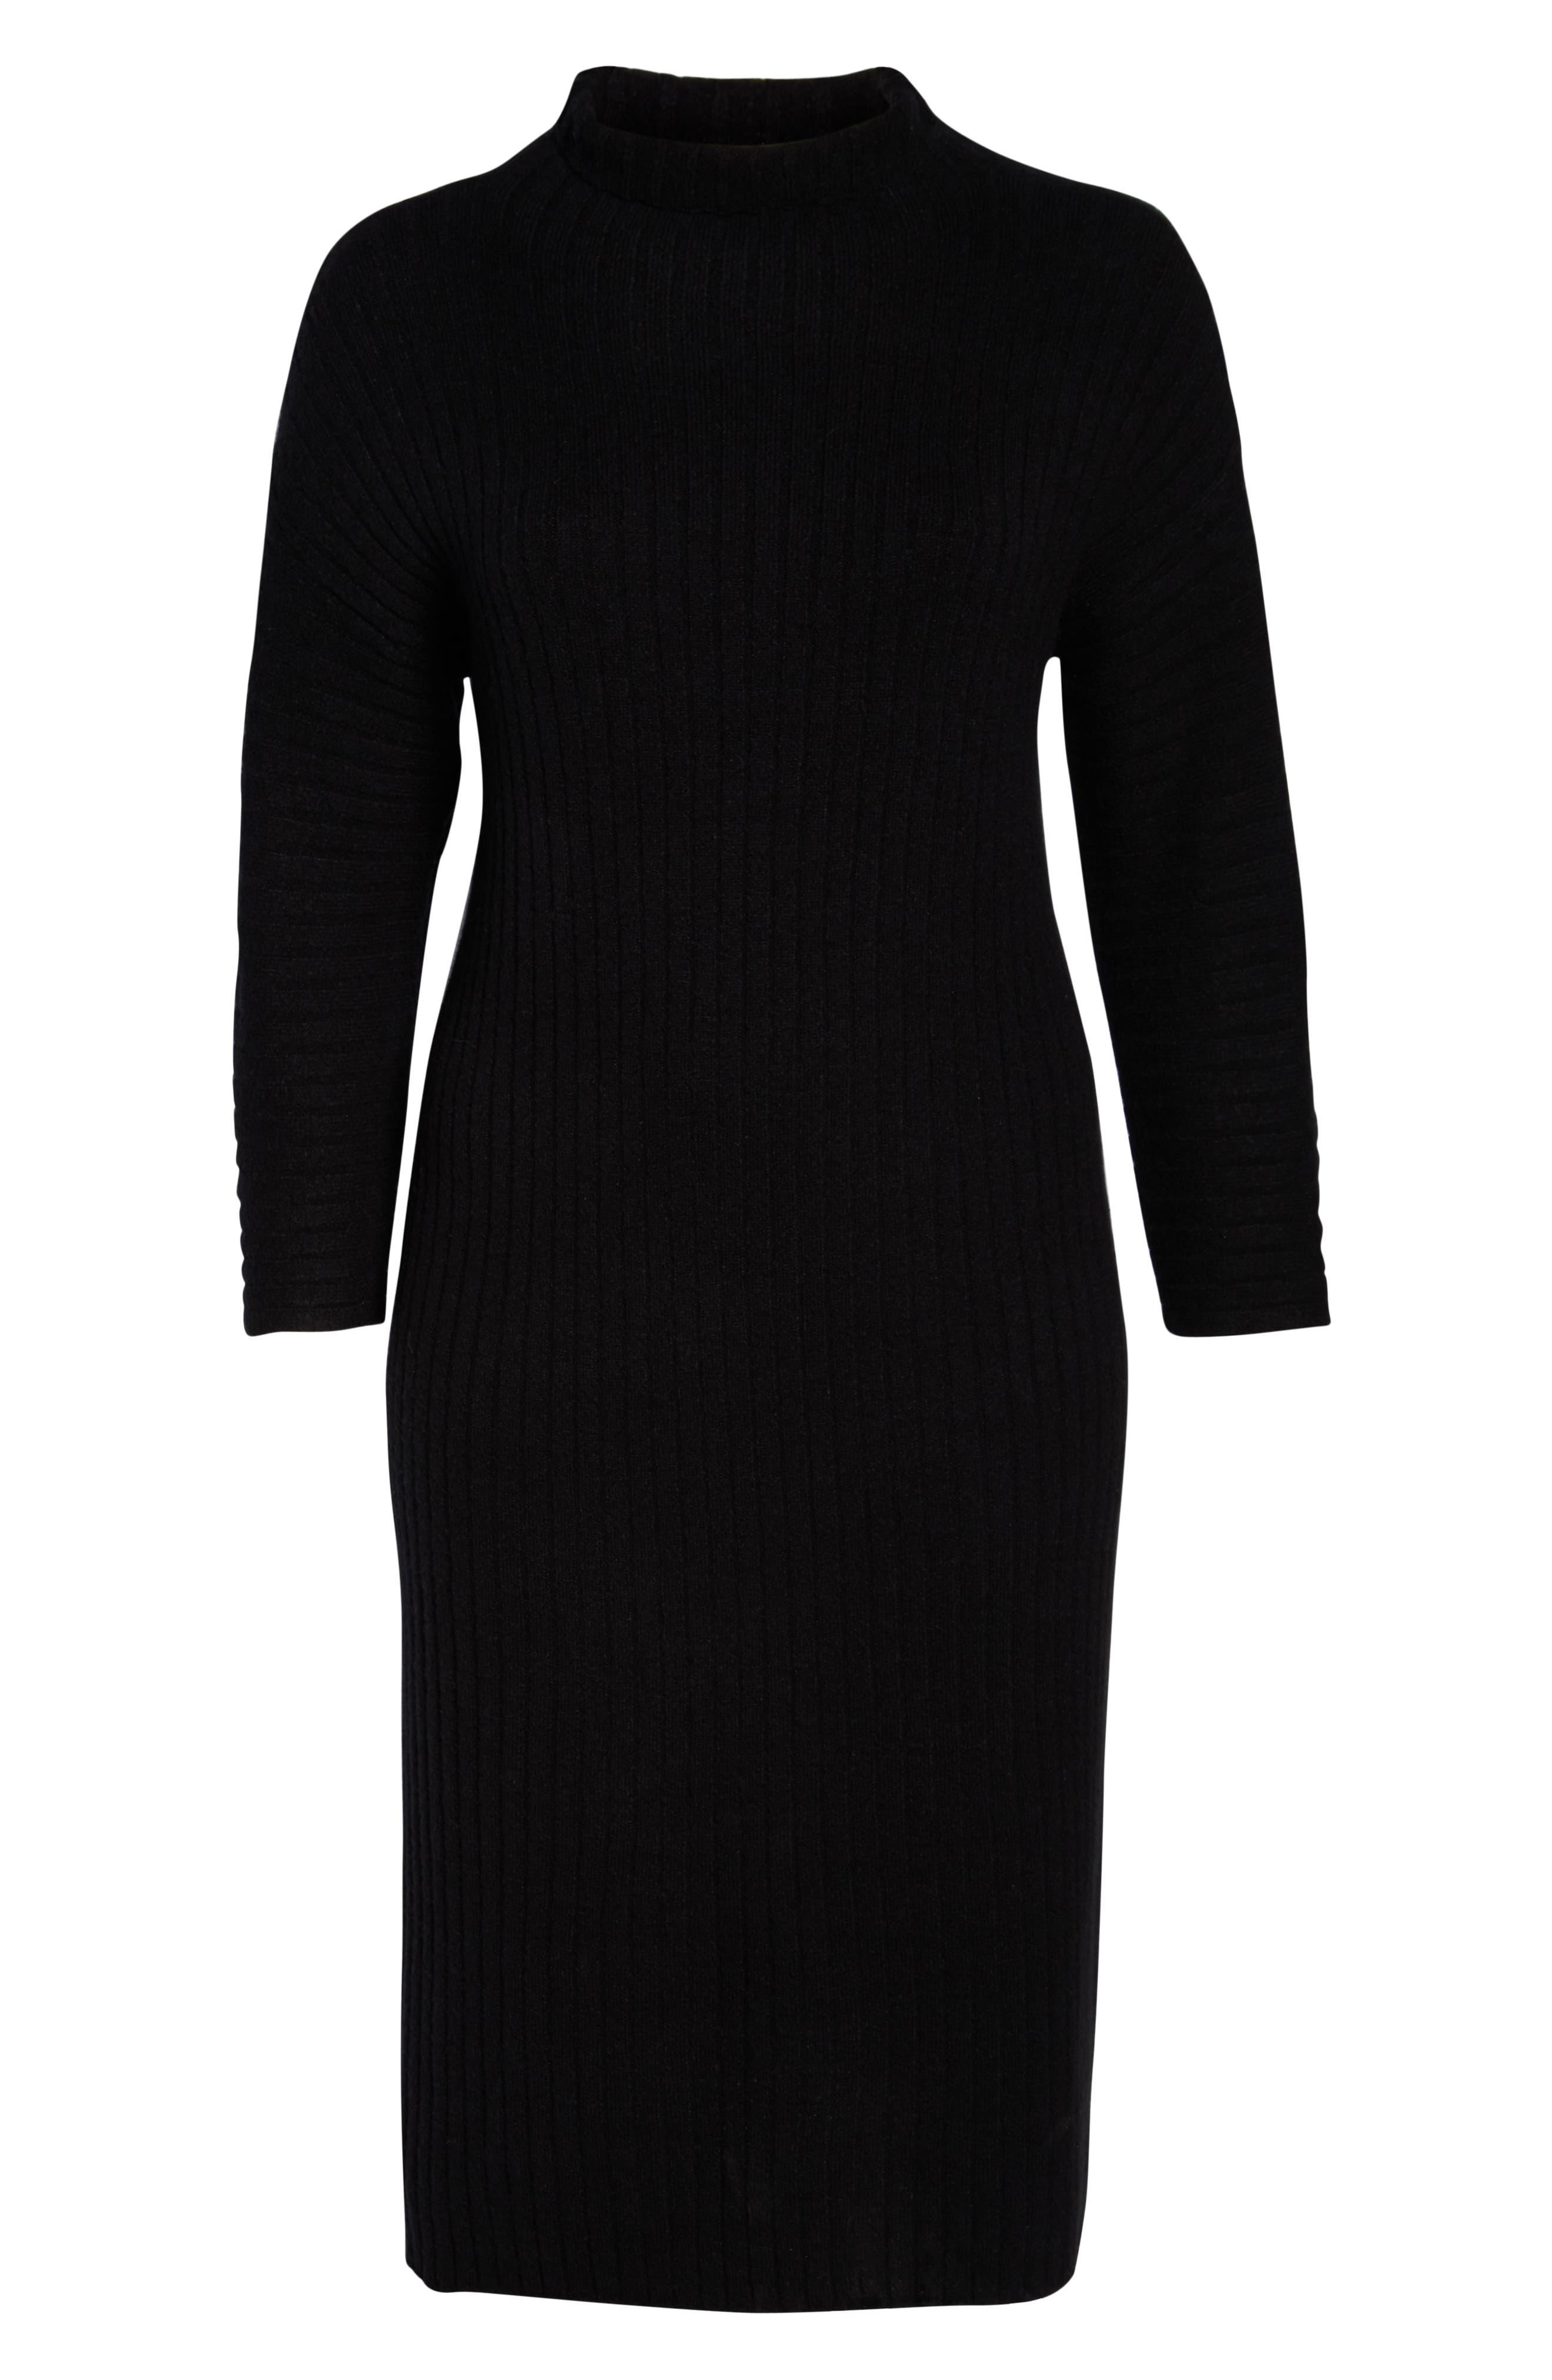 LEITH, Ribbed Midi Sweater Dress, Alternate thumbnail 7, color, BLACK